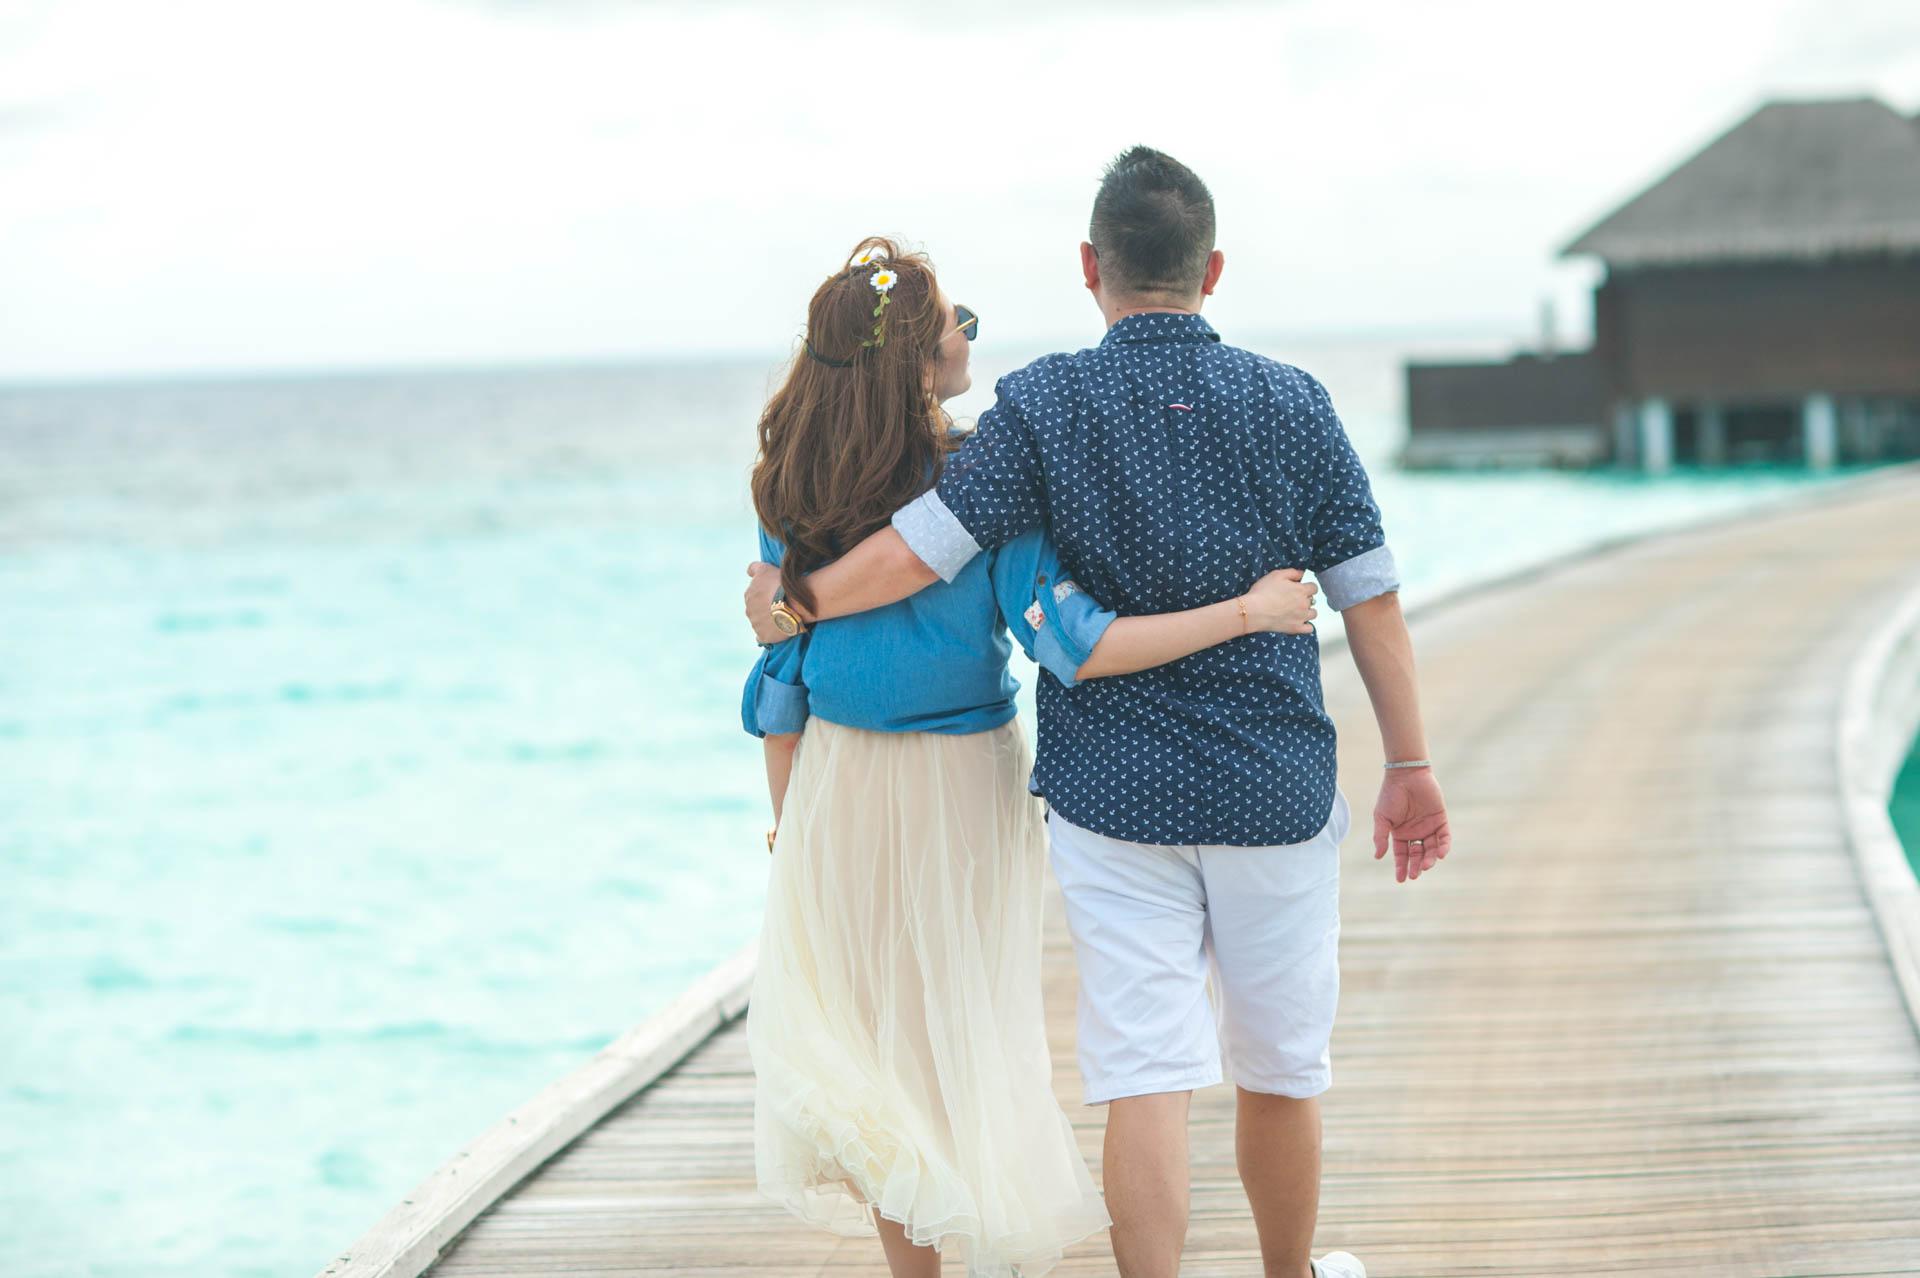 Chin Siew and Chin Yee Honeymoon in Maldives at Huvafen Fushi Resort Under Water Spa 3